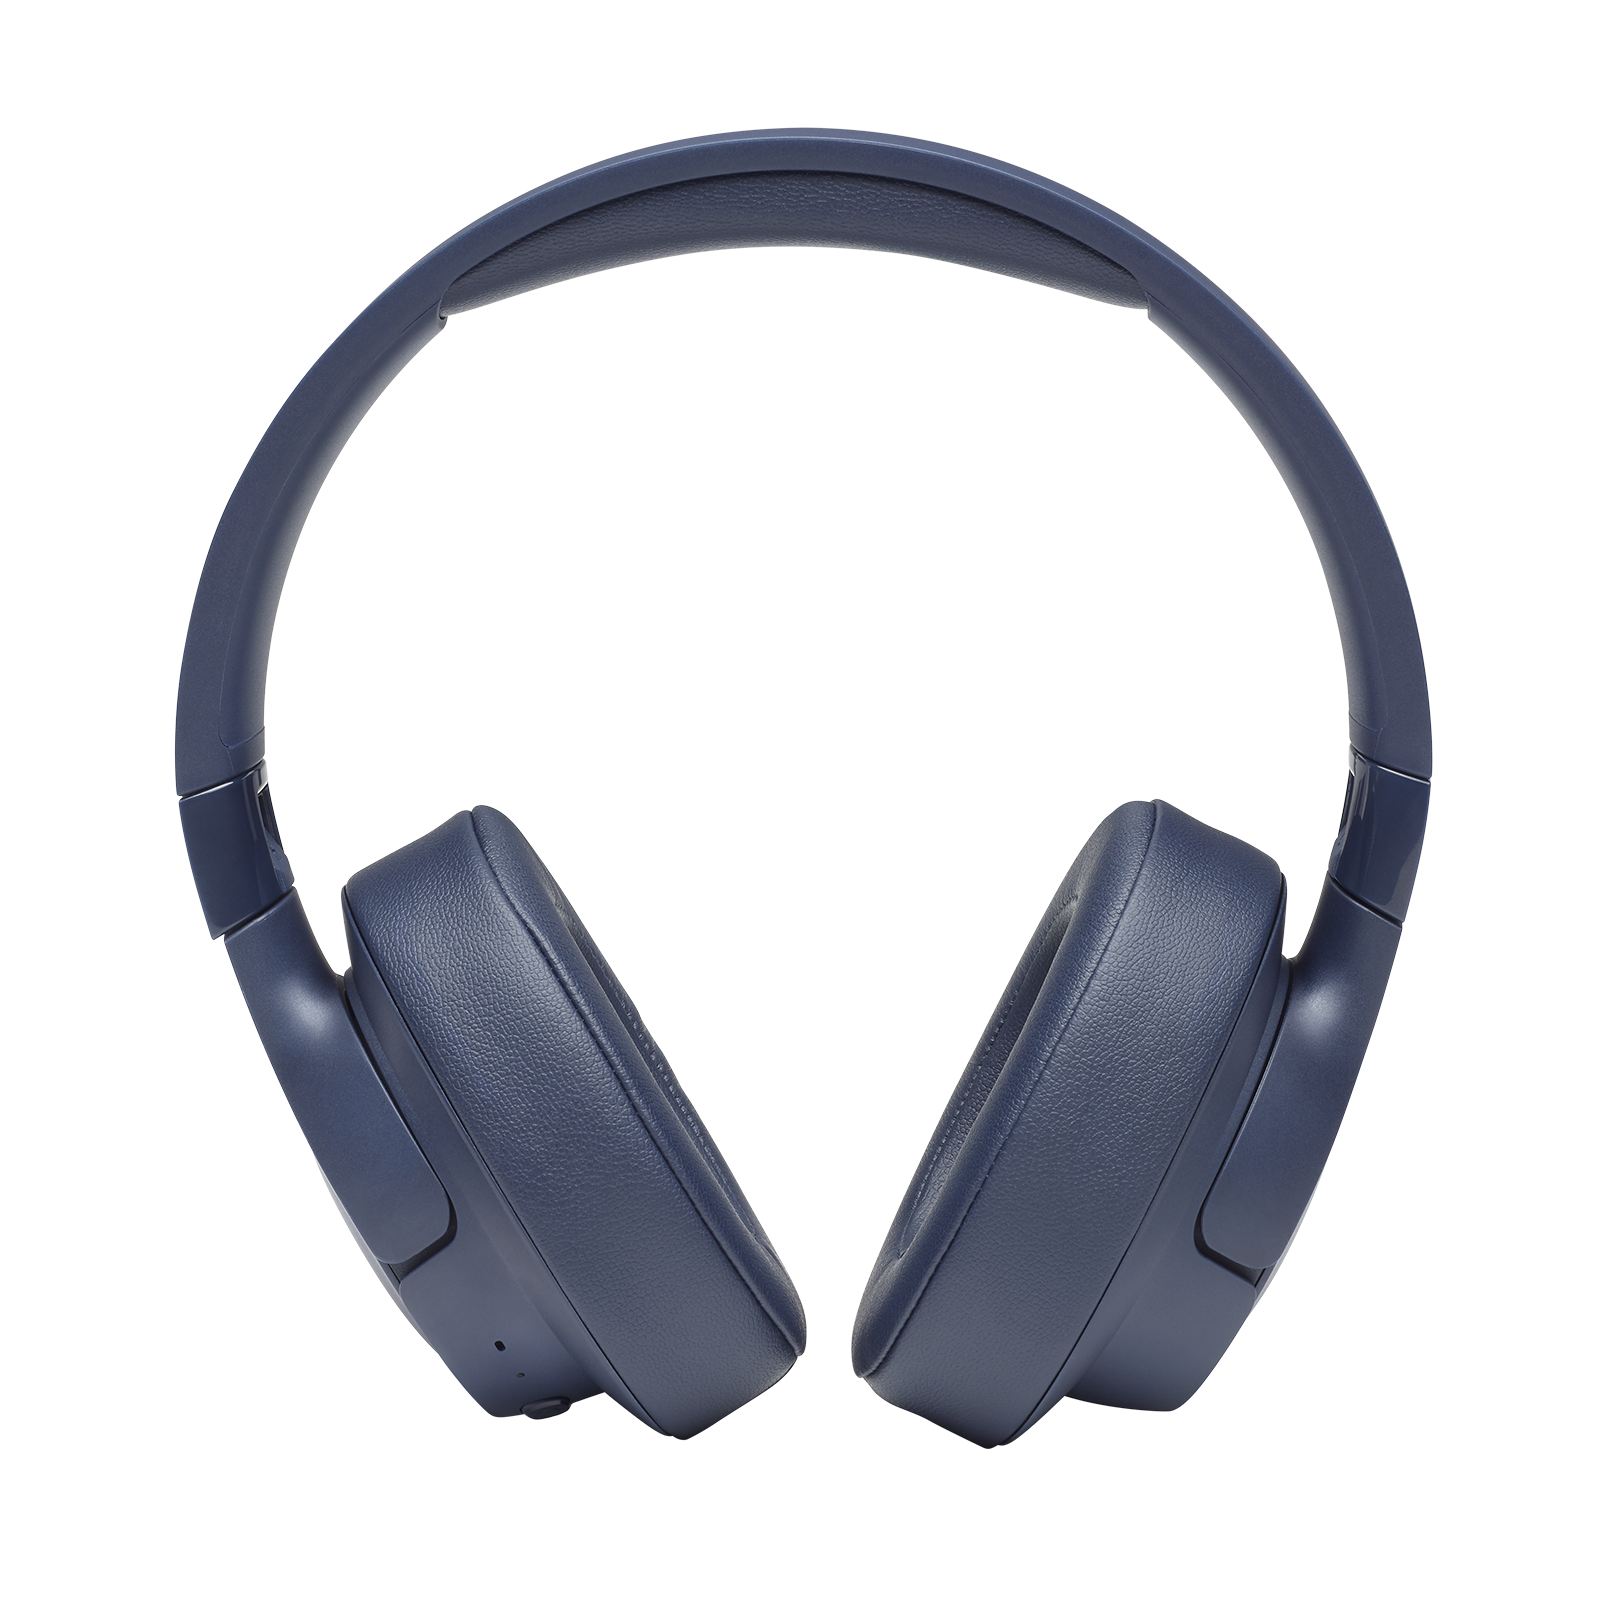 JBL TUNE 700BT - Blue - Wireless Over-Ear Headphones - Front